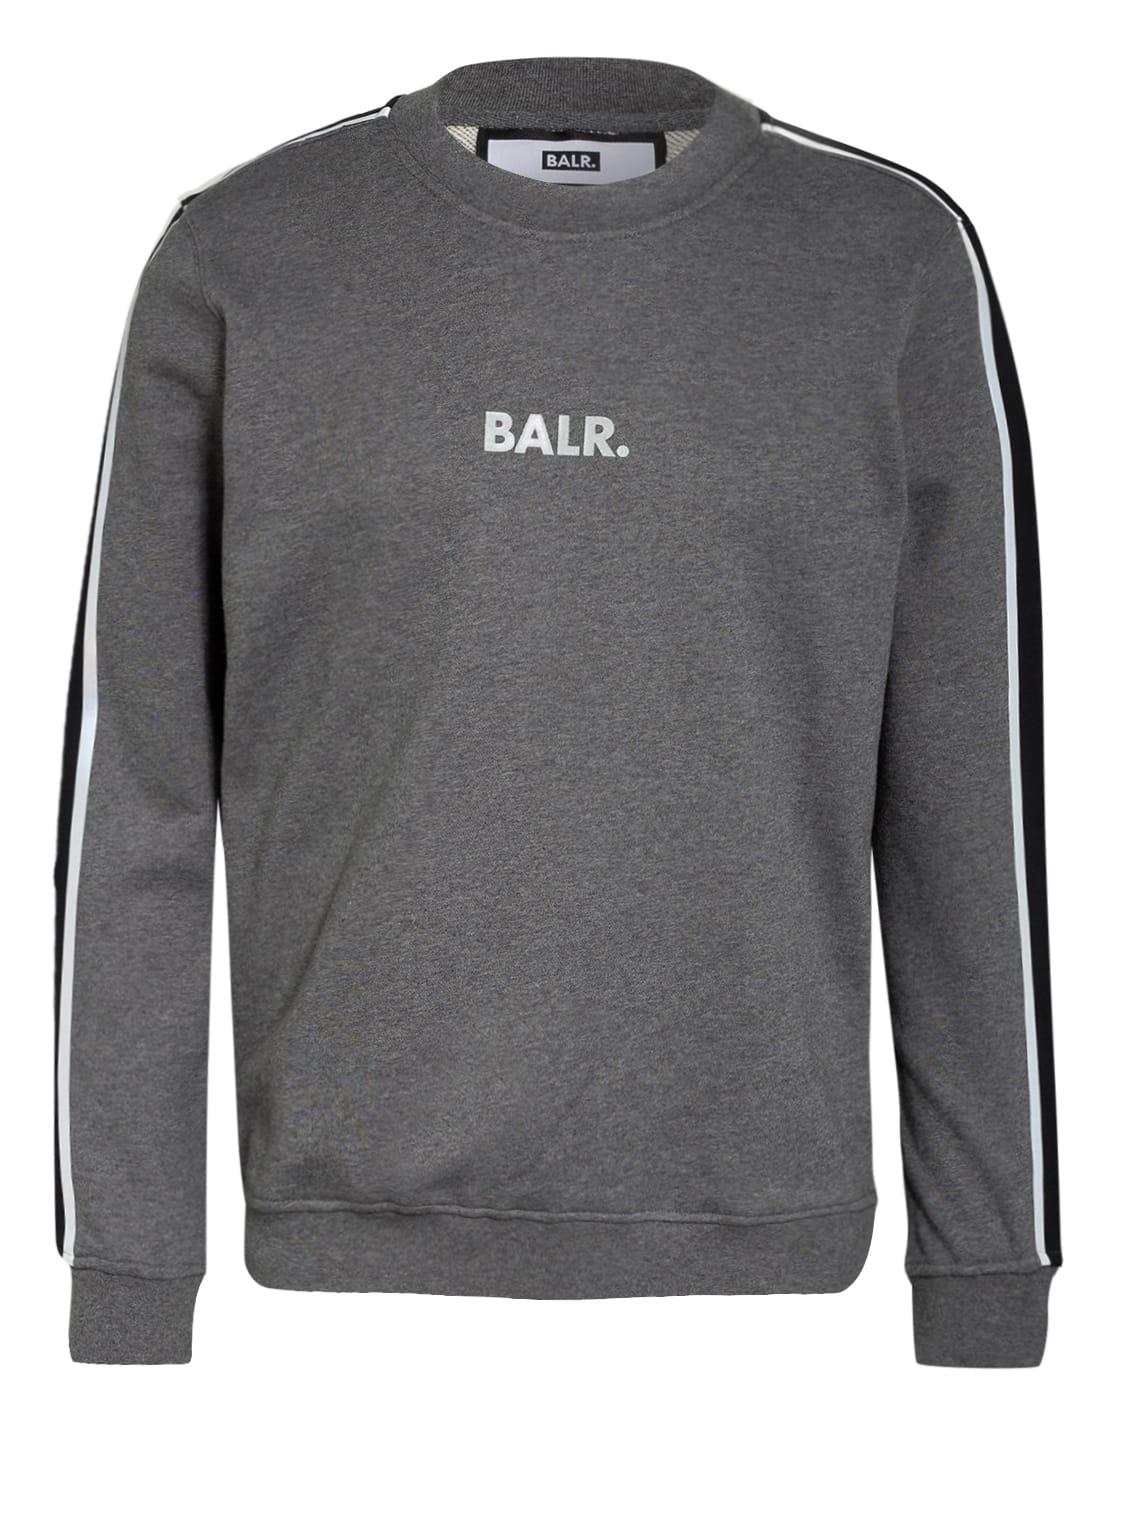 Image of Balr. Sweatshirt grau